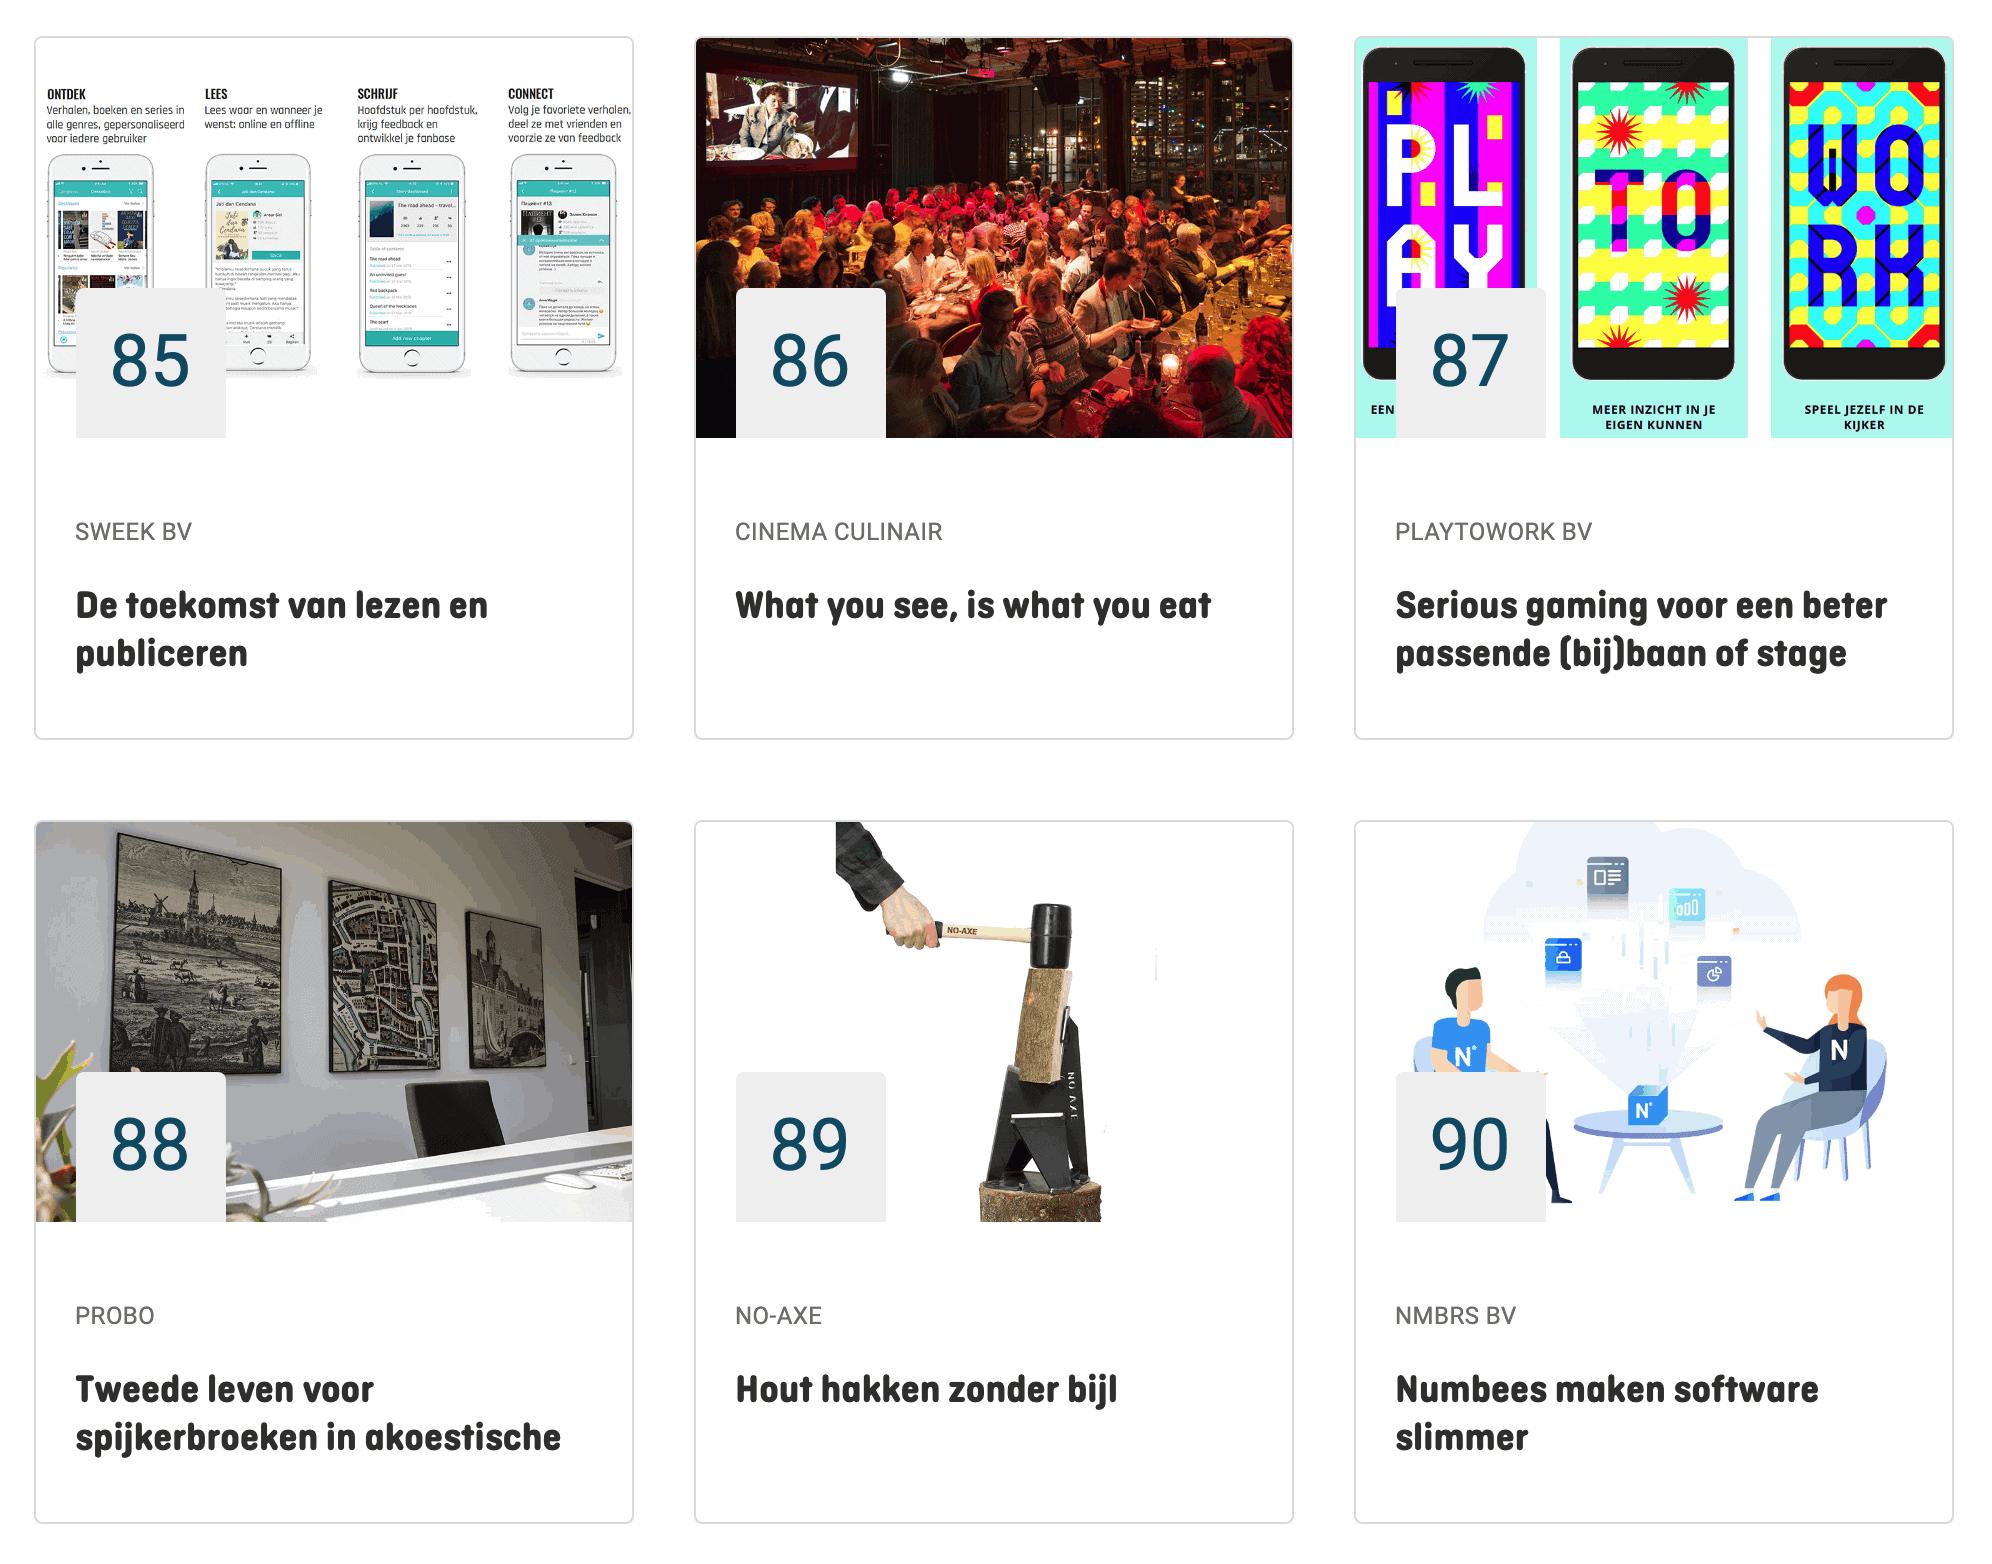 KvK Innovatie 2019